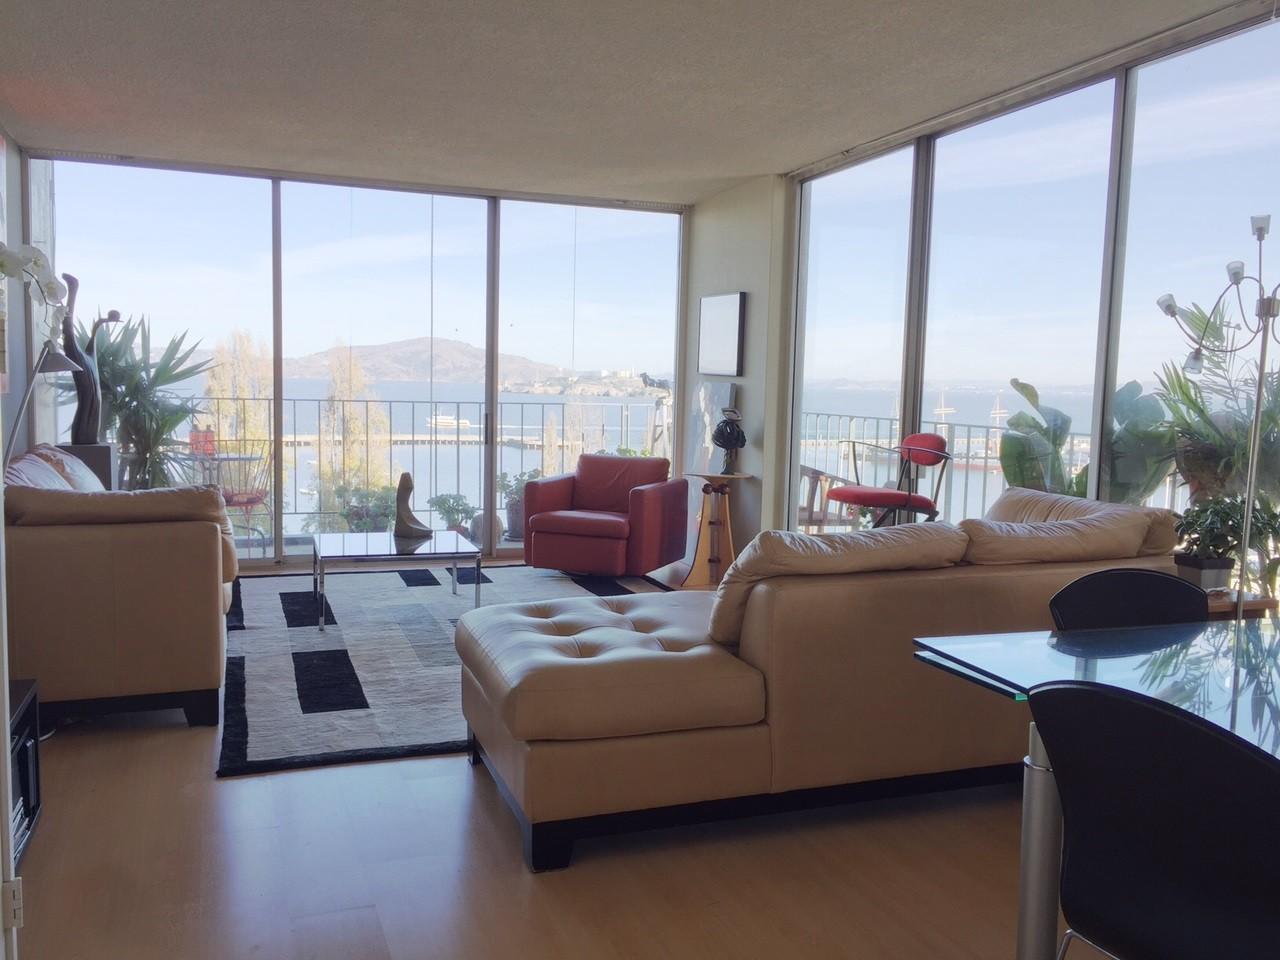 north point street 509 san francisco ca 94109 1 bedroom apartment